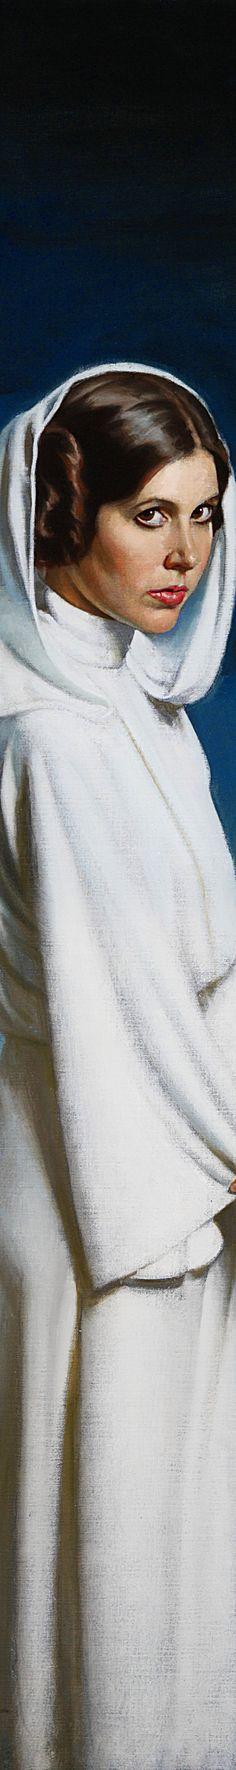 Stars Wars - Princess Leia